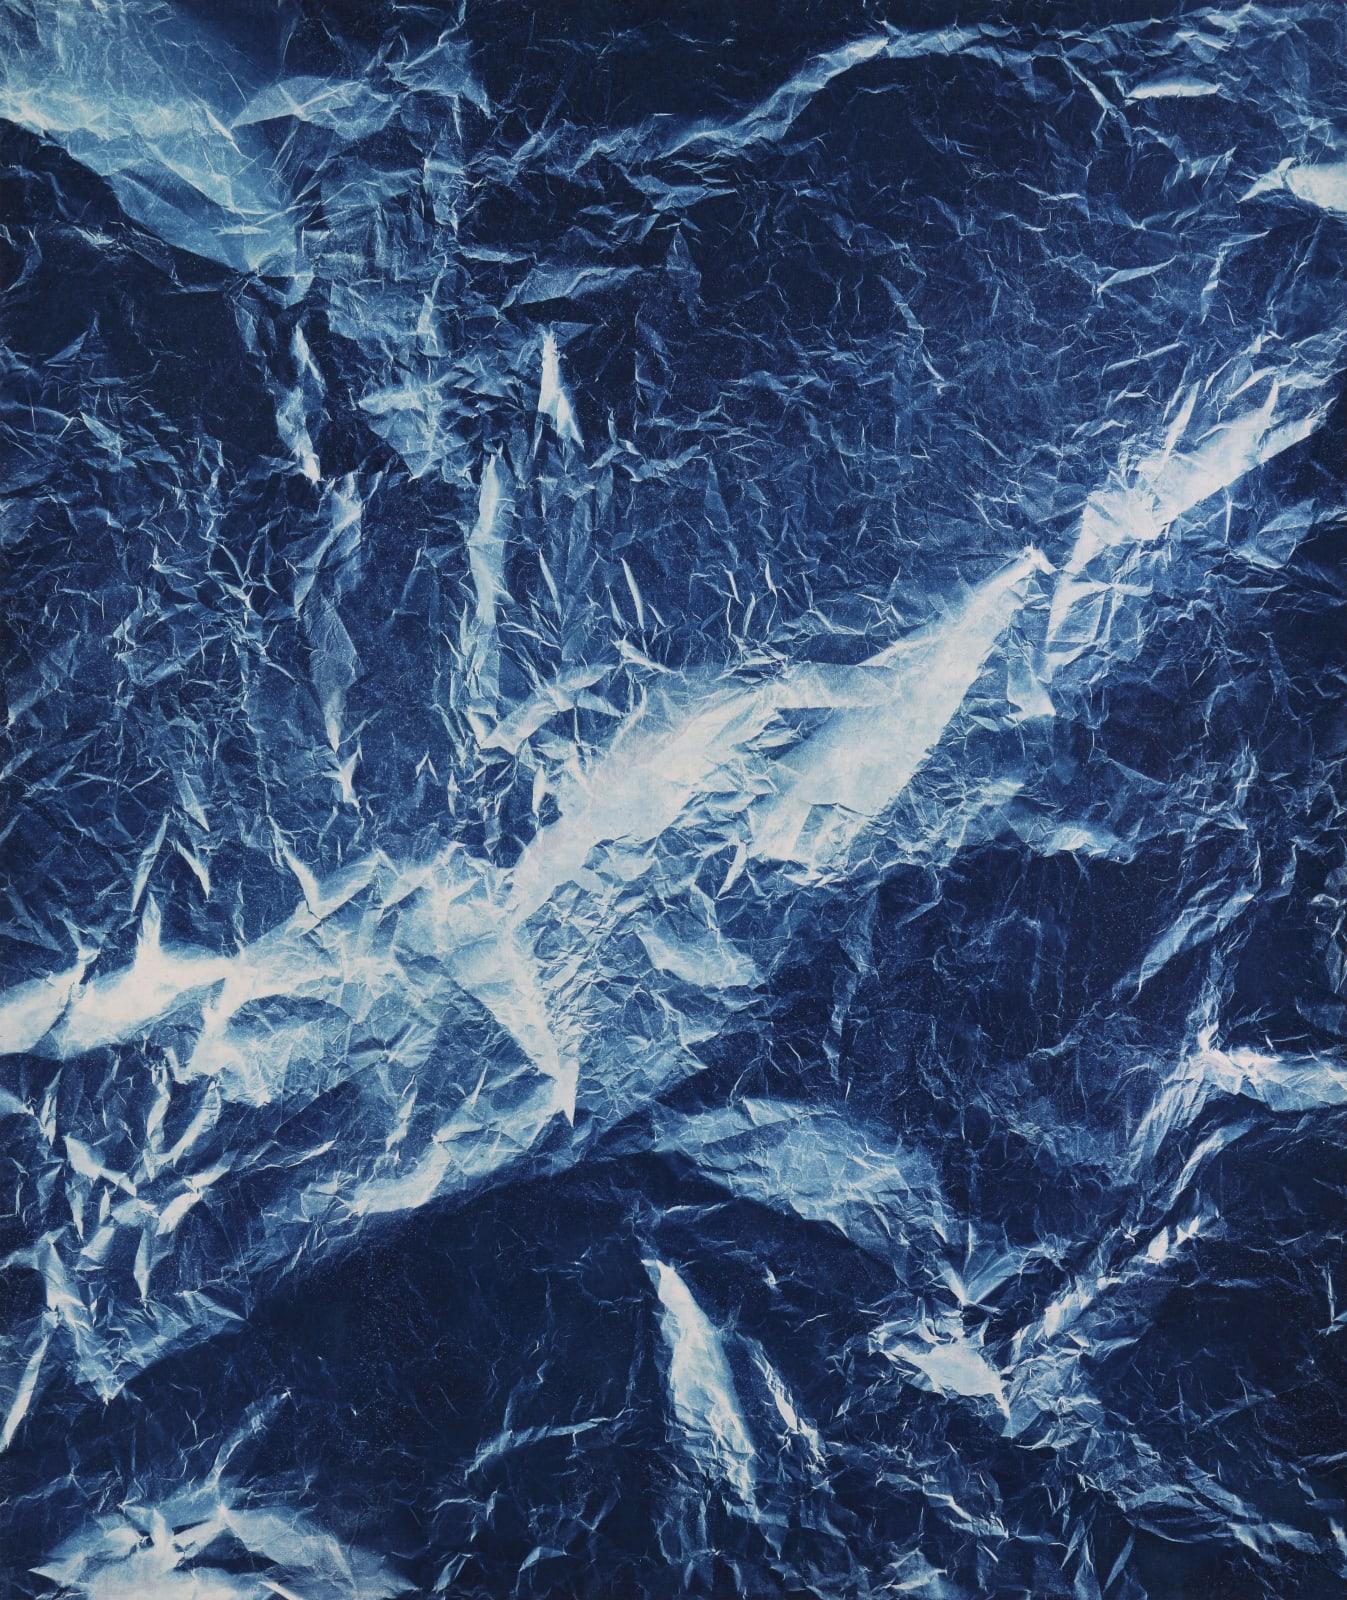 Wu Chi-Tsung 吳季璁, Wrinkled Texture 058 皴法習作之五十八, 2019